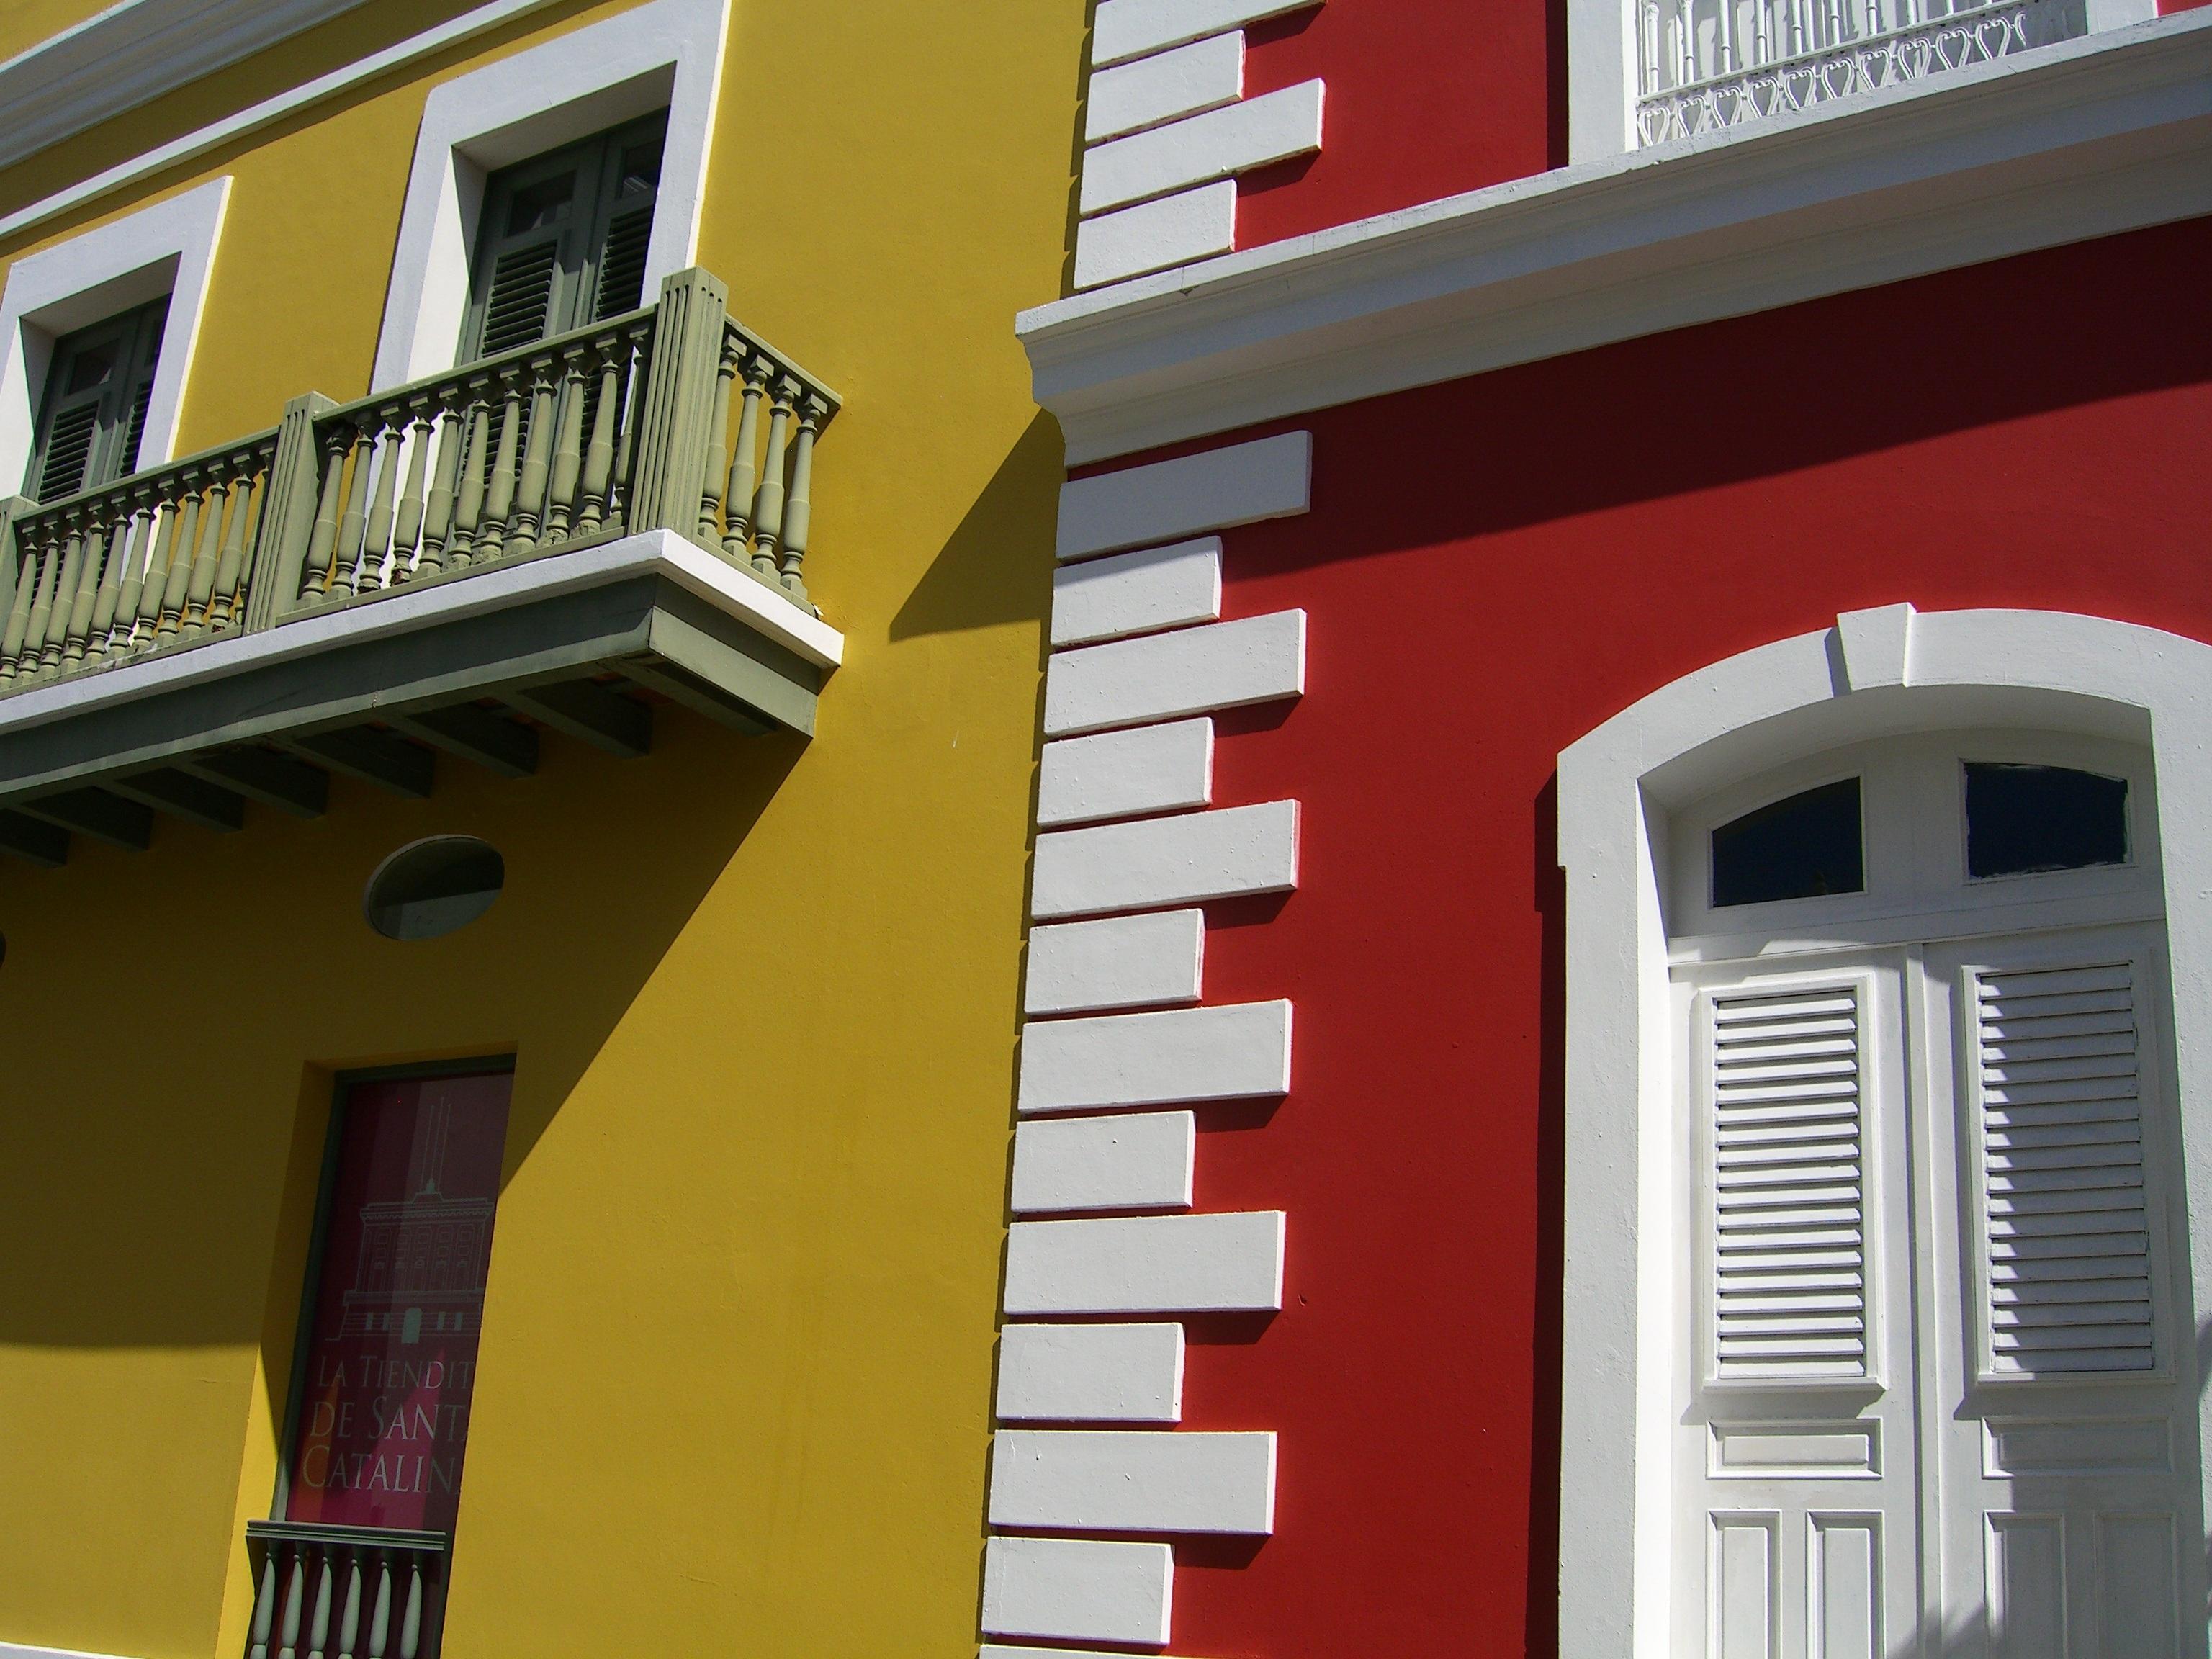 casa ventana edificio antiguo casa pared rojo color fachada diseo de interiores edificios ventanas puertas